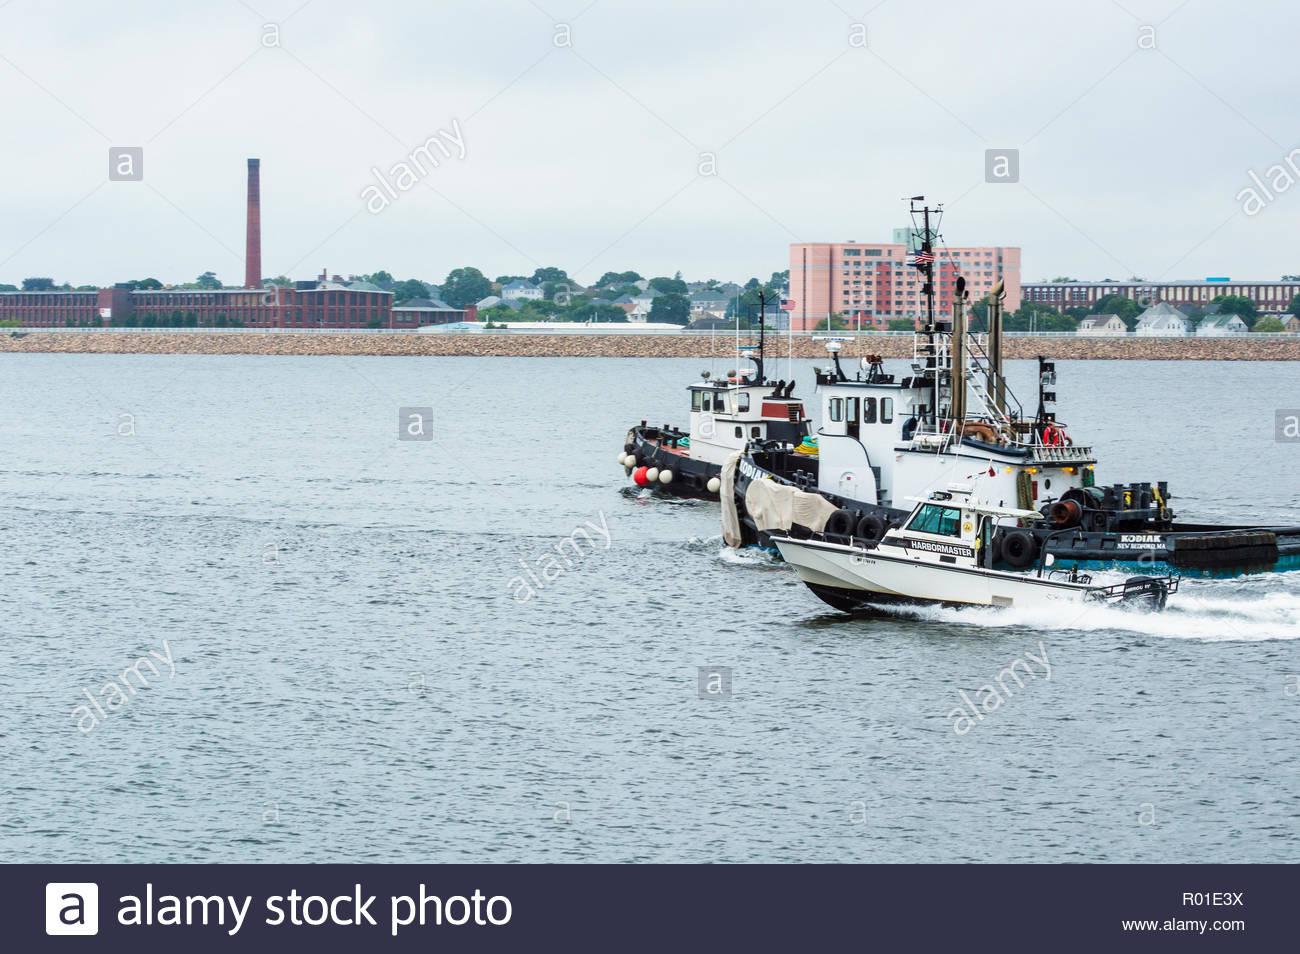 New Bedford, Massachusetts, USA - August 15, 2018: Fairhaven harbormaster's patrol boat accelerating past tugs Jaguar and Kodiak - Stock Image